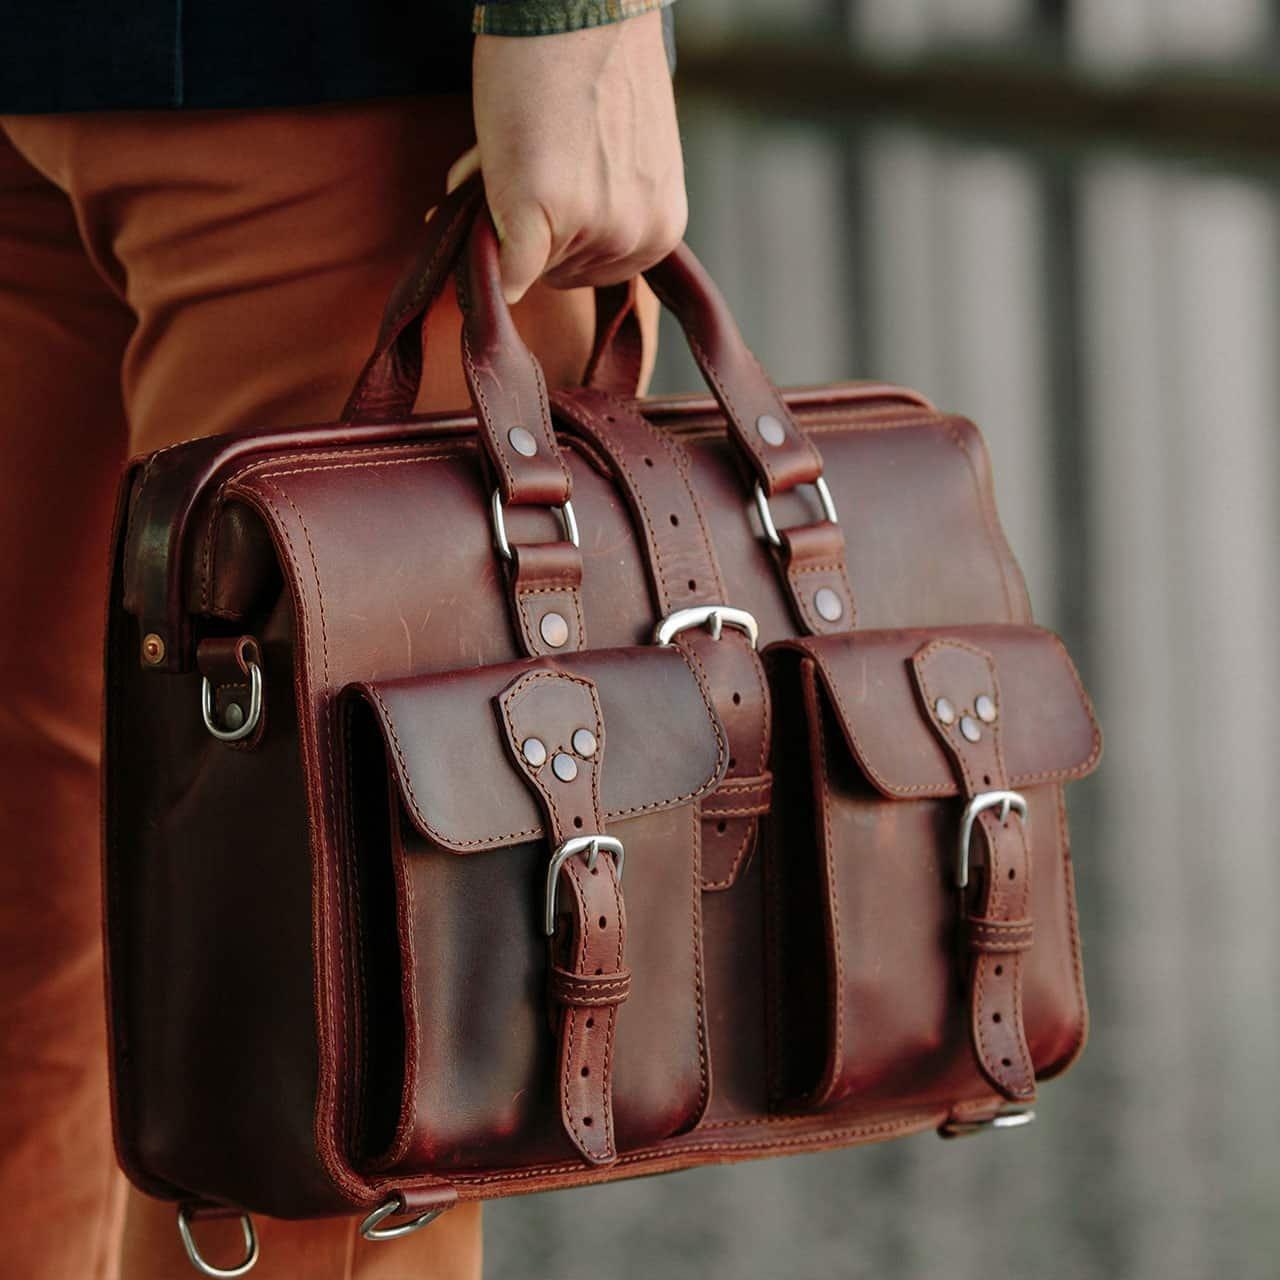 Saddleback Leather Co. Flight Bag 15-inch Full Grain Leather Expandable Laptop Briefcase for Men Includes 100 Year Warranty by Saddleback Leather Co. (Image #6)